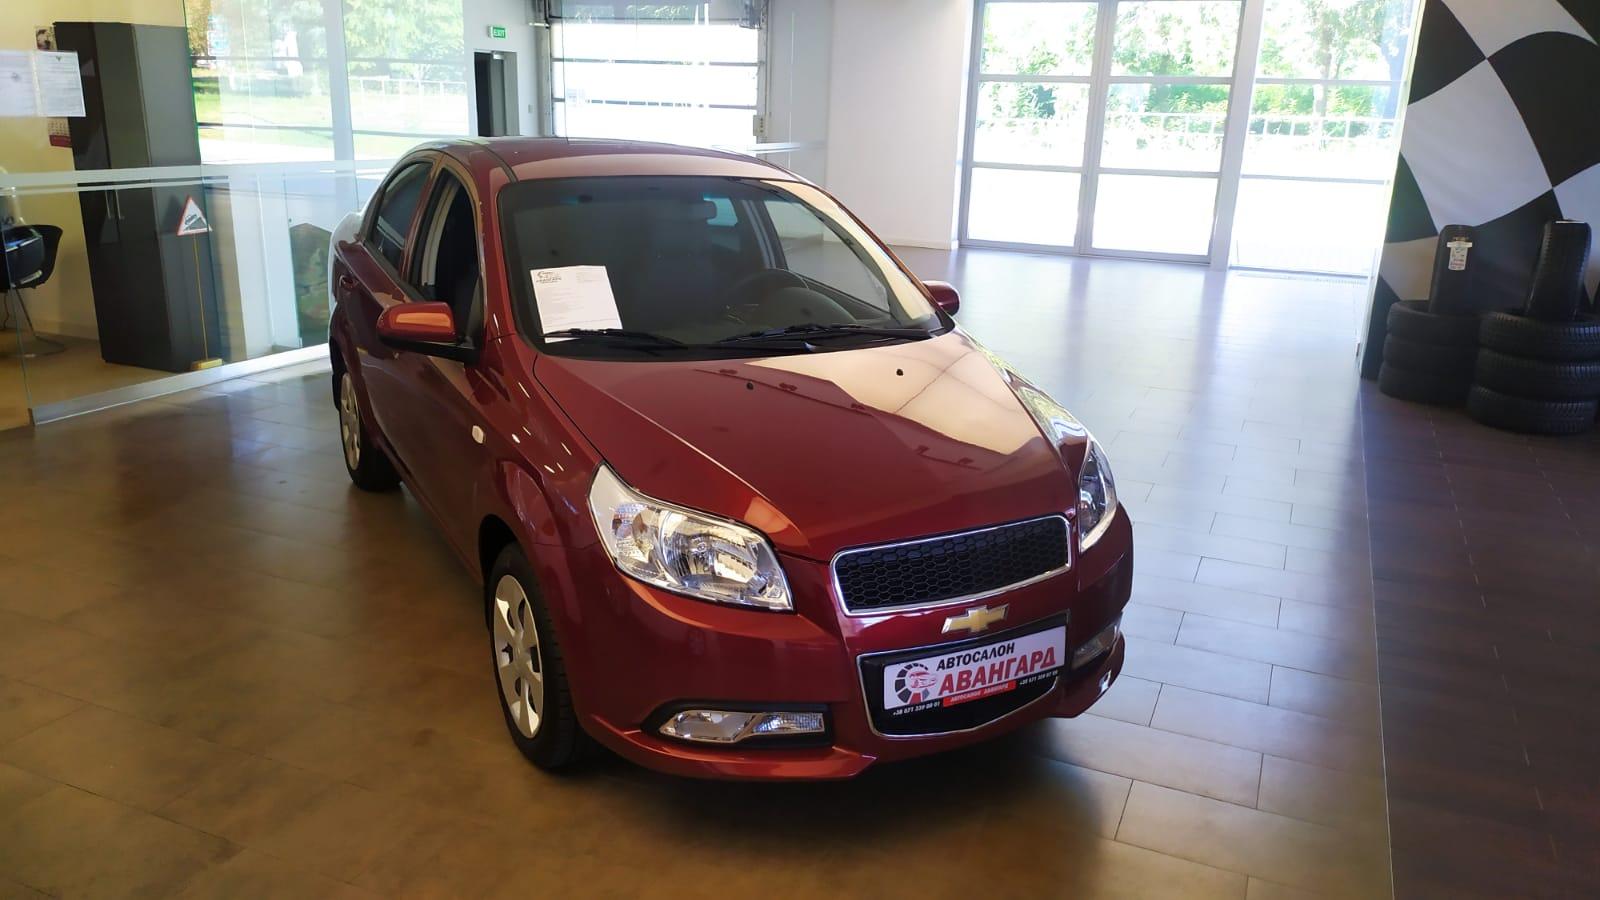 Chevrolet Nexia 1.5 16 кл. (105 л.с.) 6АТ, комплектации LT, Красный. 2021